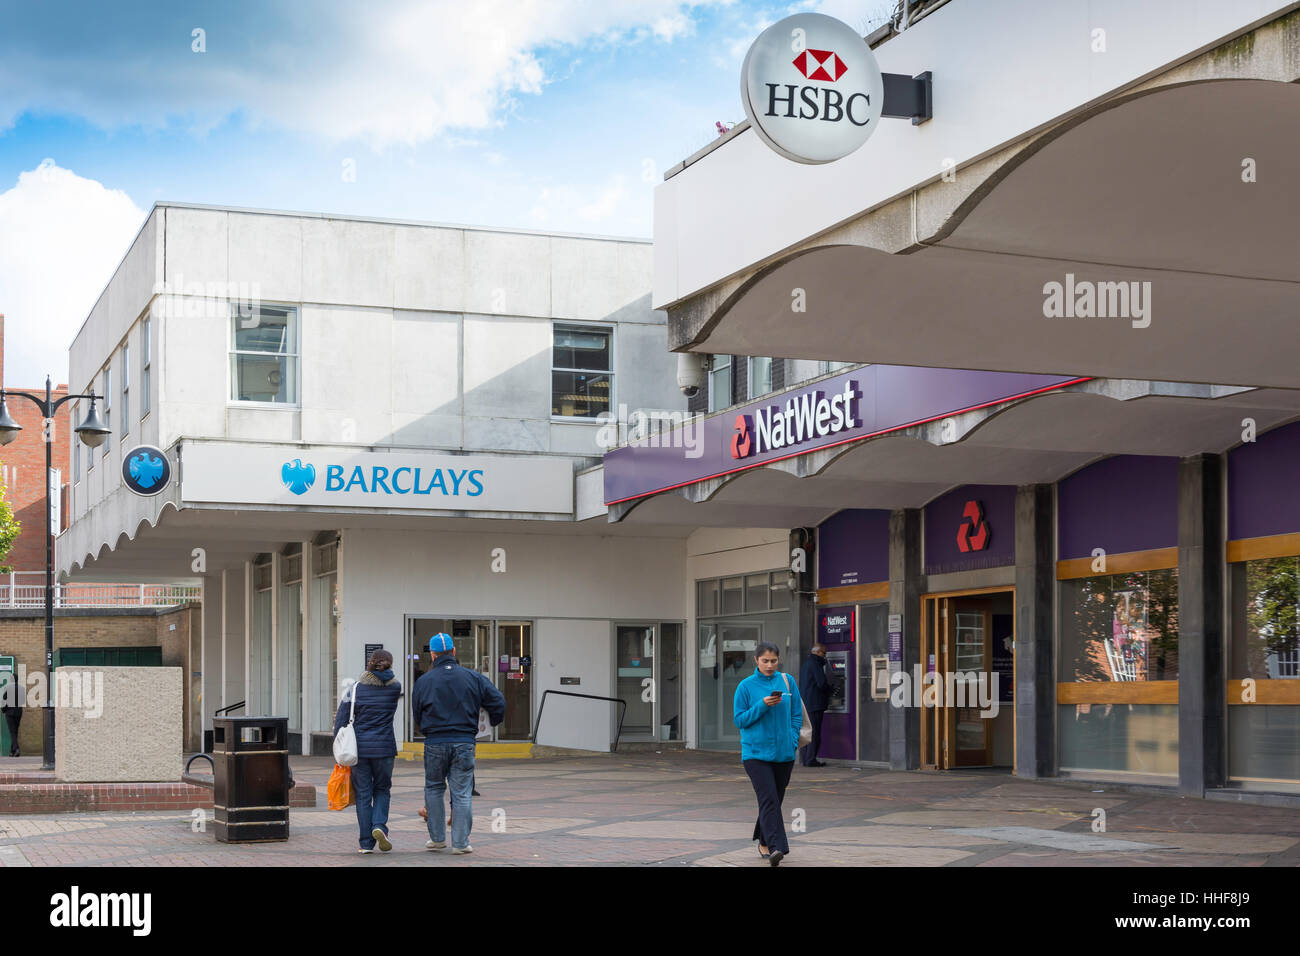 High Street banks (Barclays, NatWest, HSBC), Bracknell, Berkshire, England, United Kingdom - Stock Image